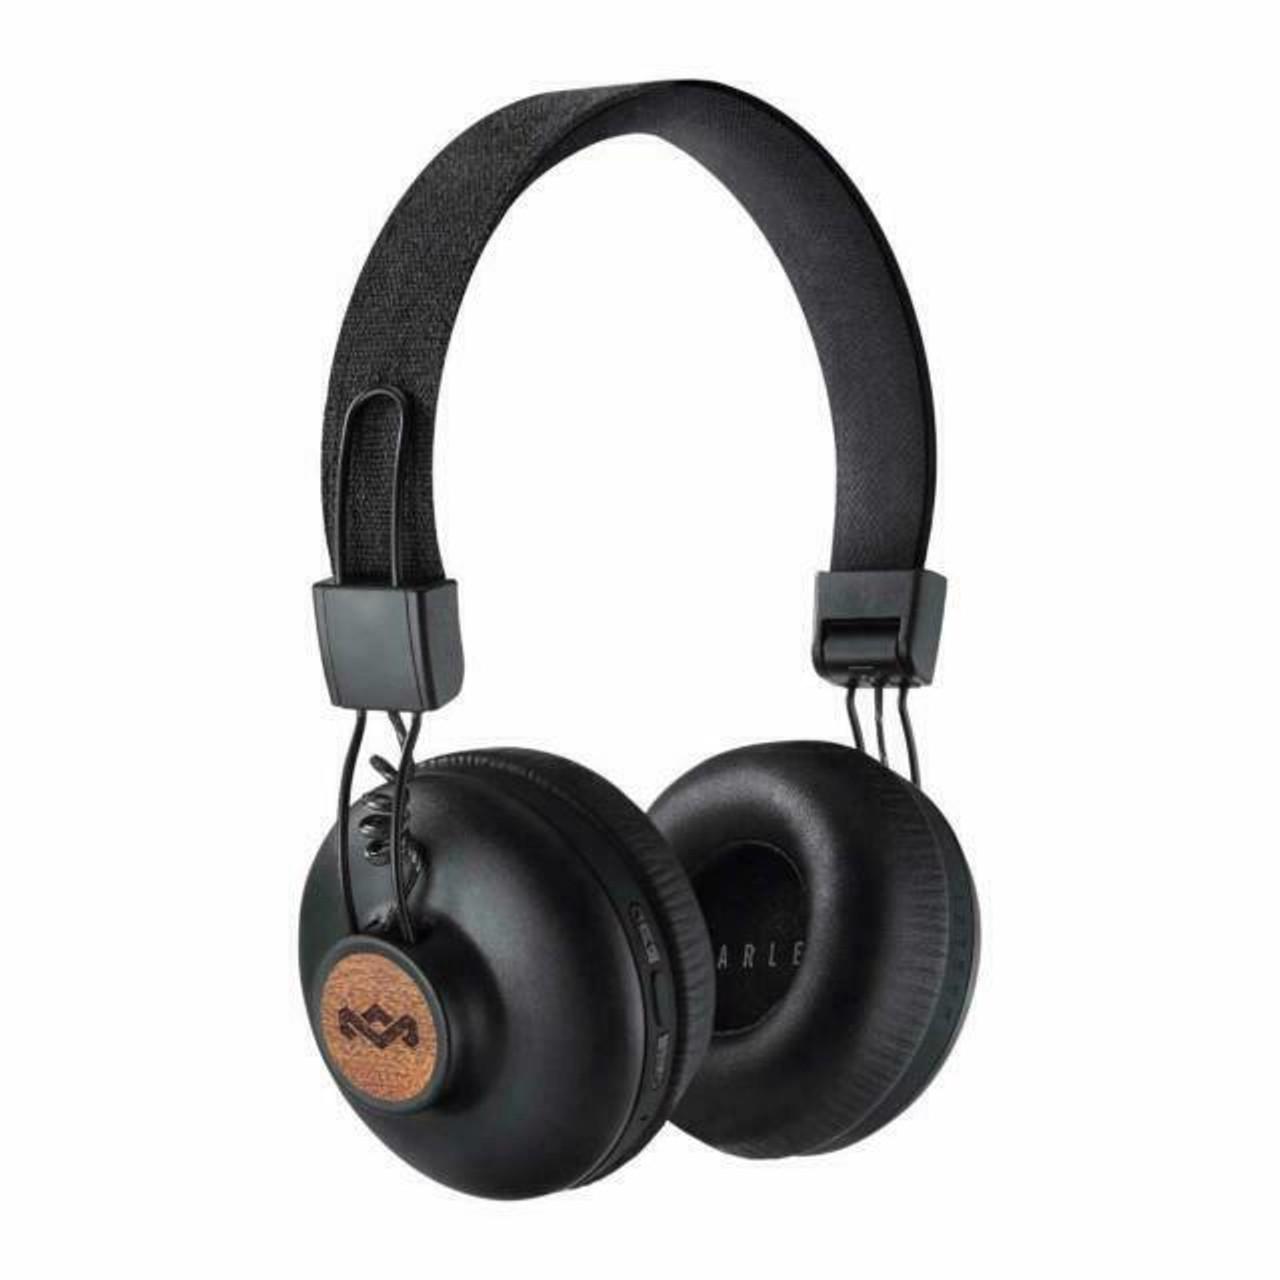 House of Marley EMJA133SB Positive Vibration 2 Over the Ear Headphones - Black